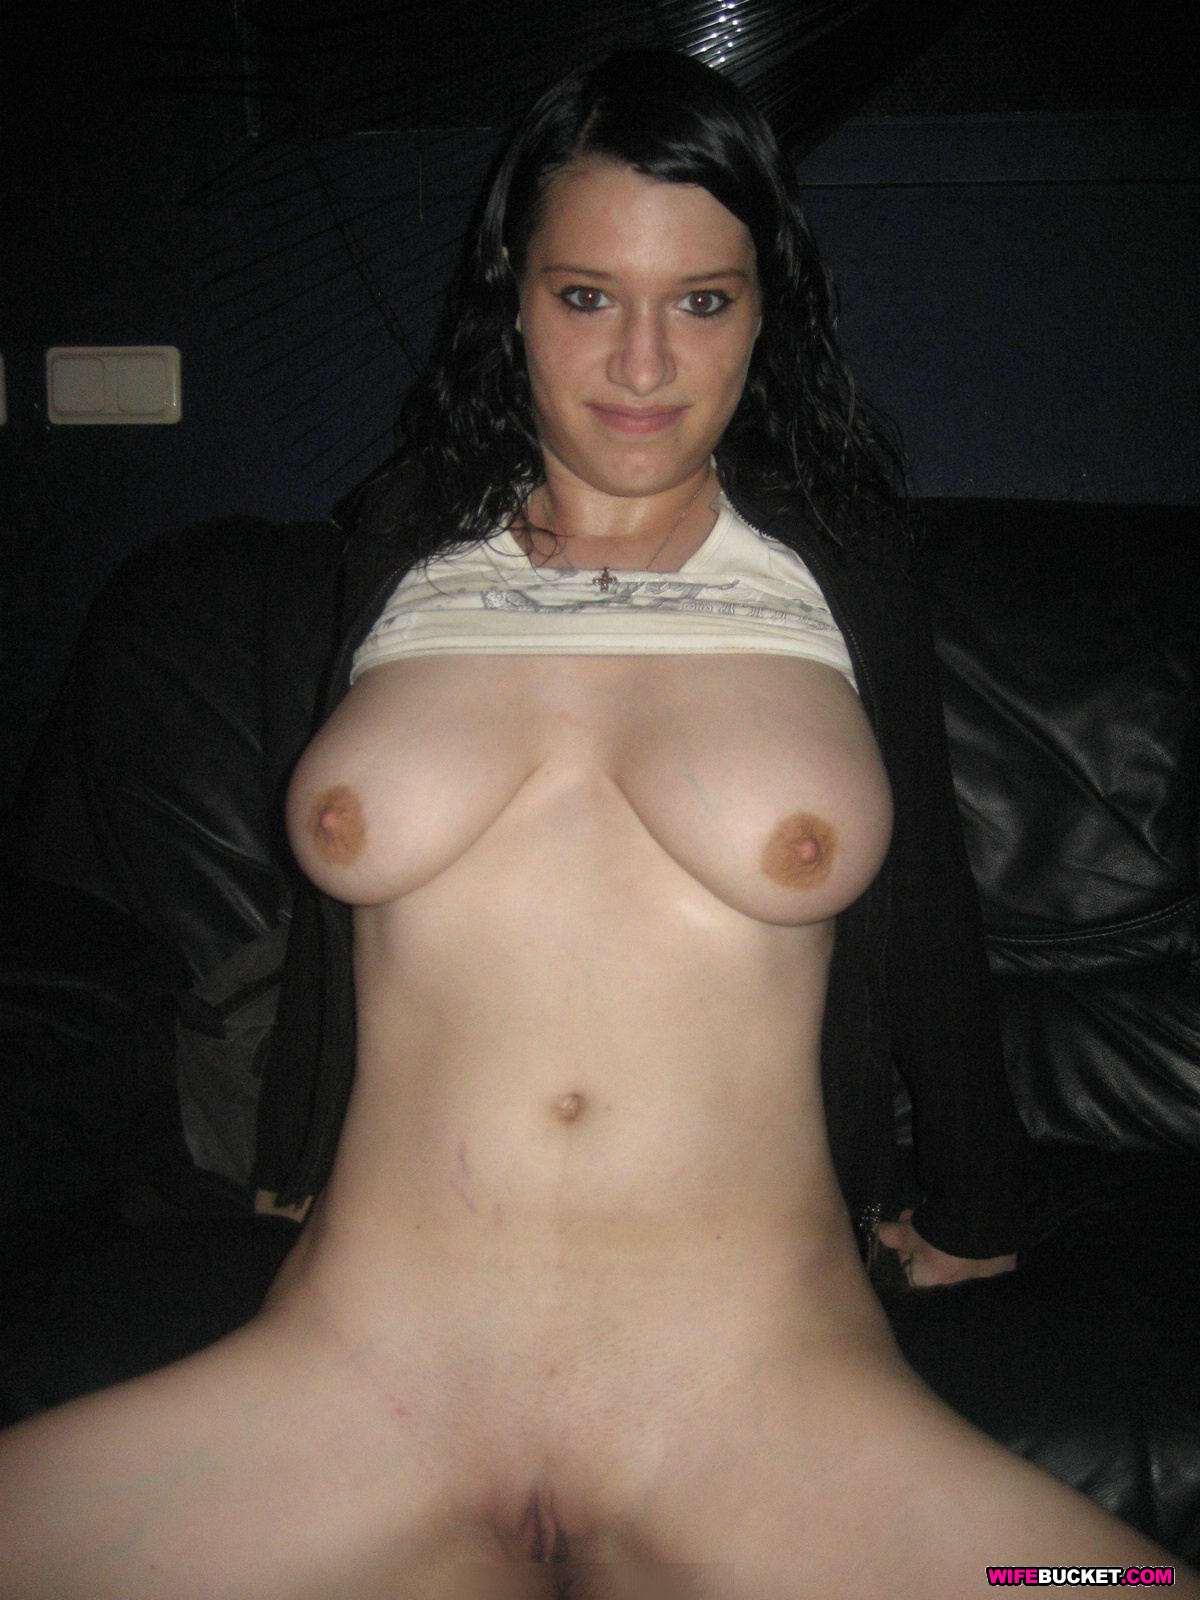 Nude wife sex pics